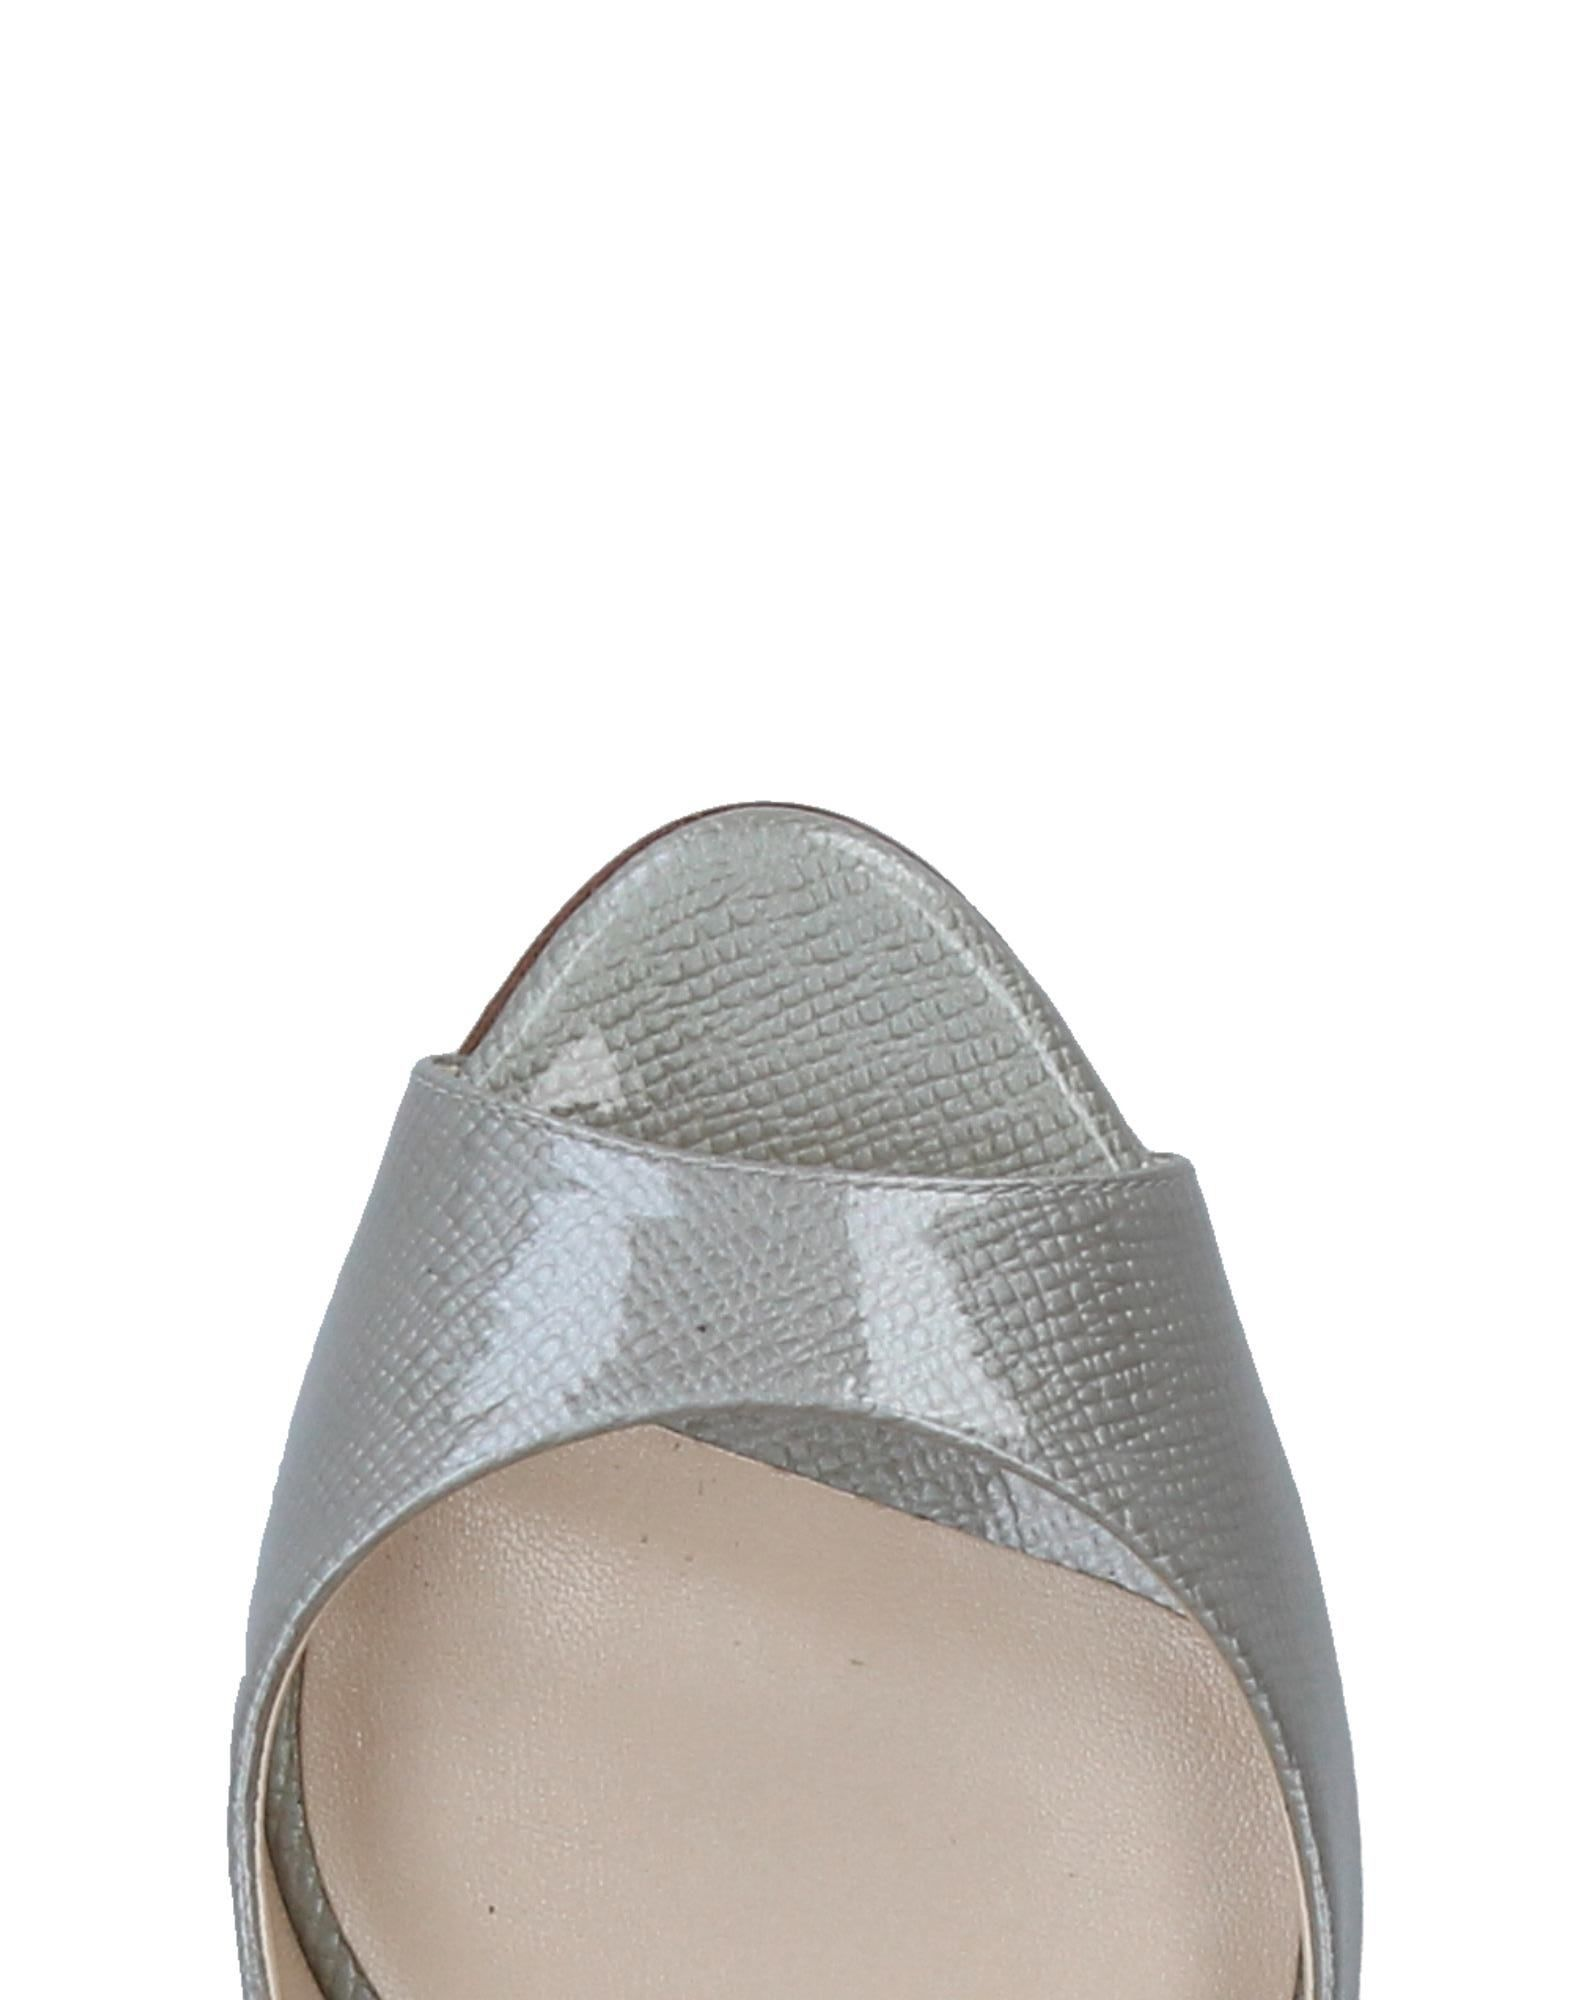 Deimille Pumps Pumps Deimille Damen  11358098GA Gute Qualität beliebte Schuhe 612eee